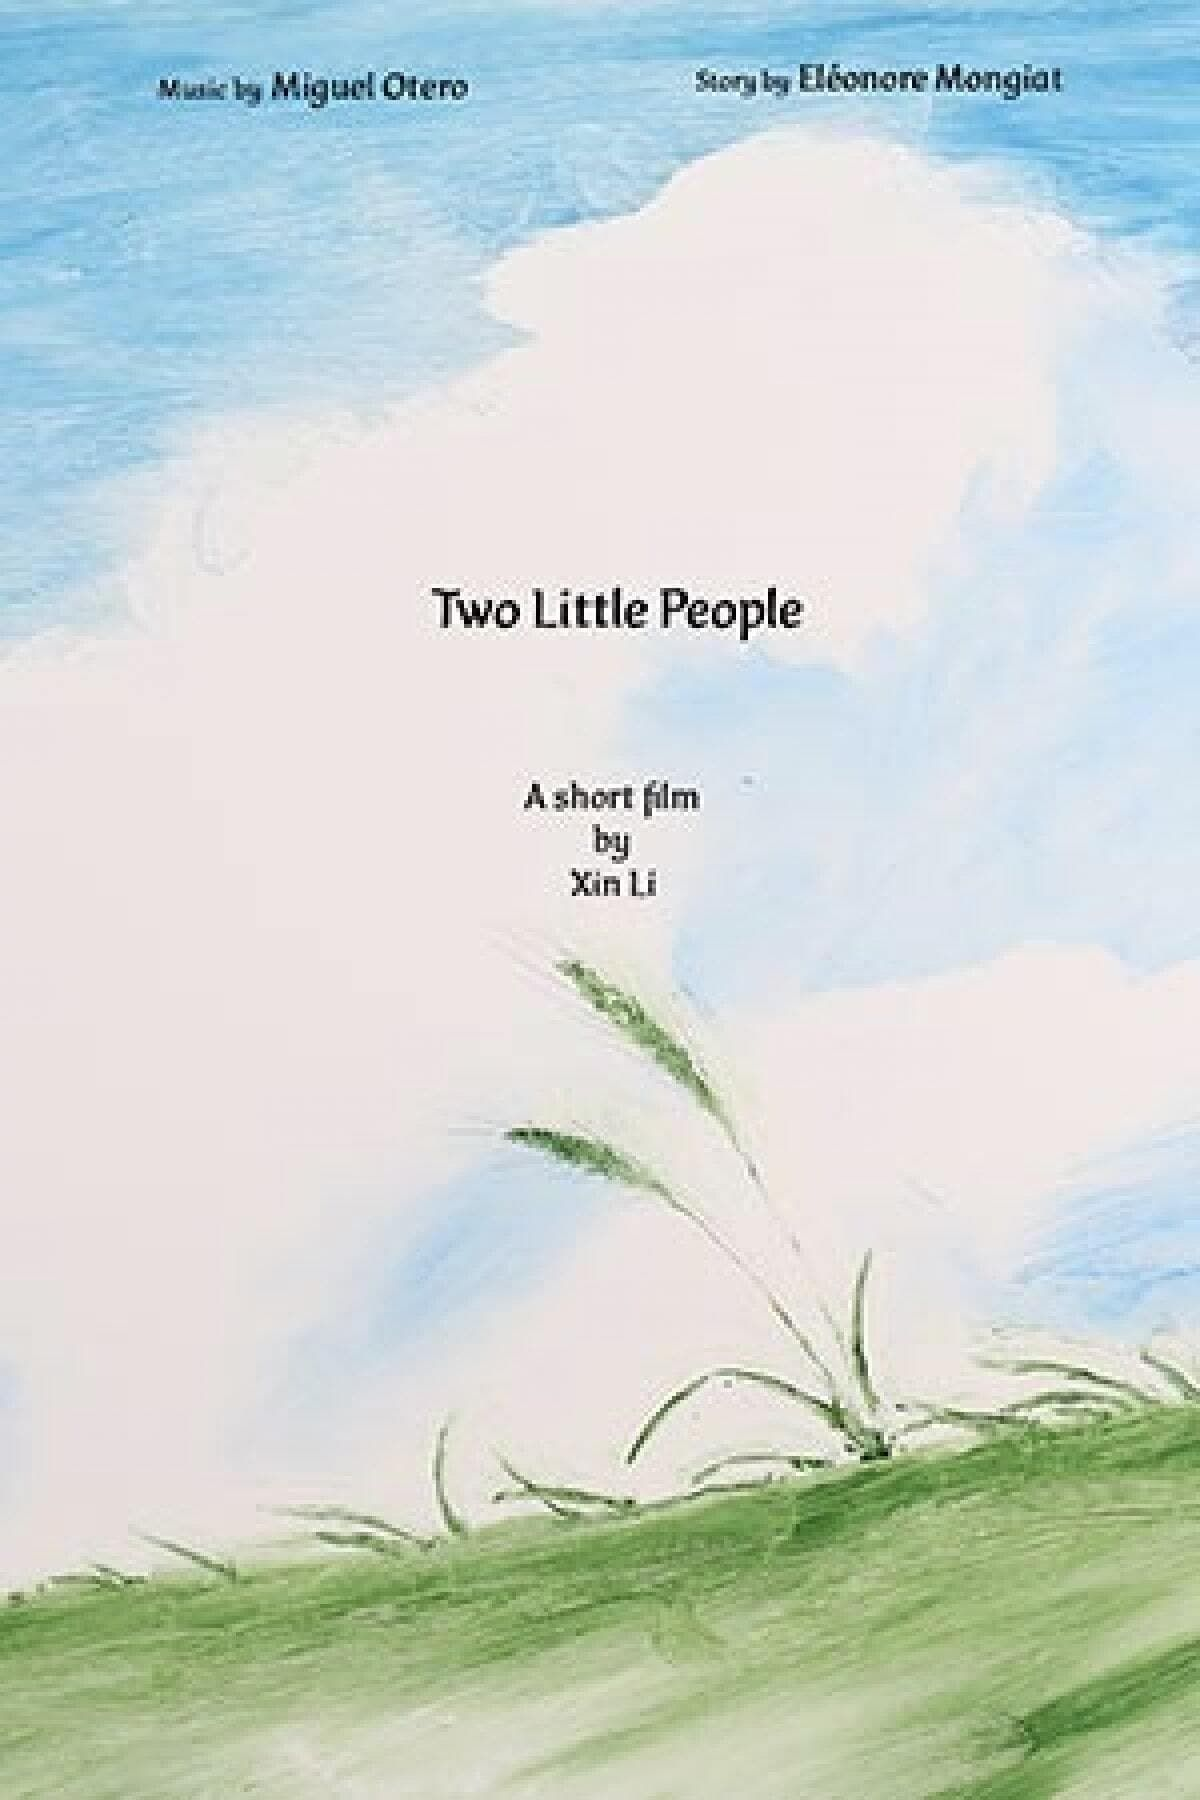 Two little people